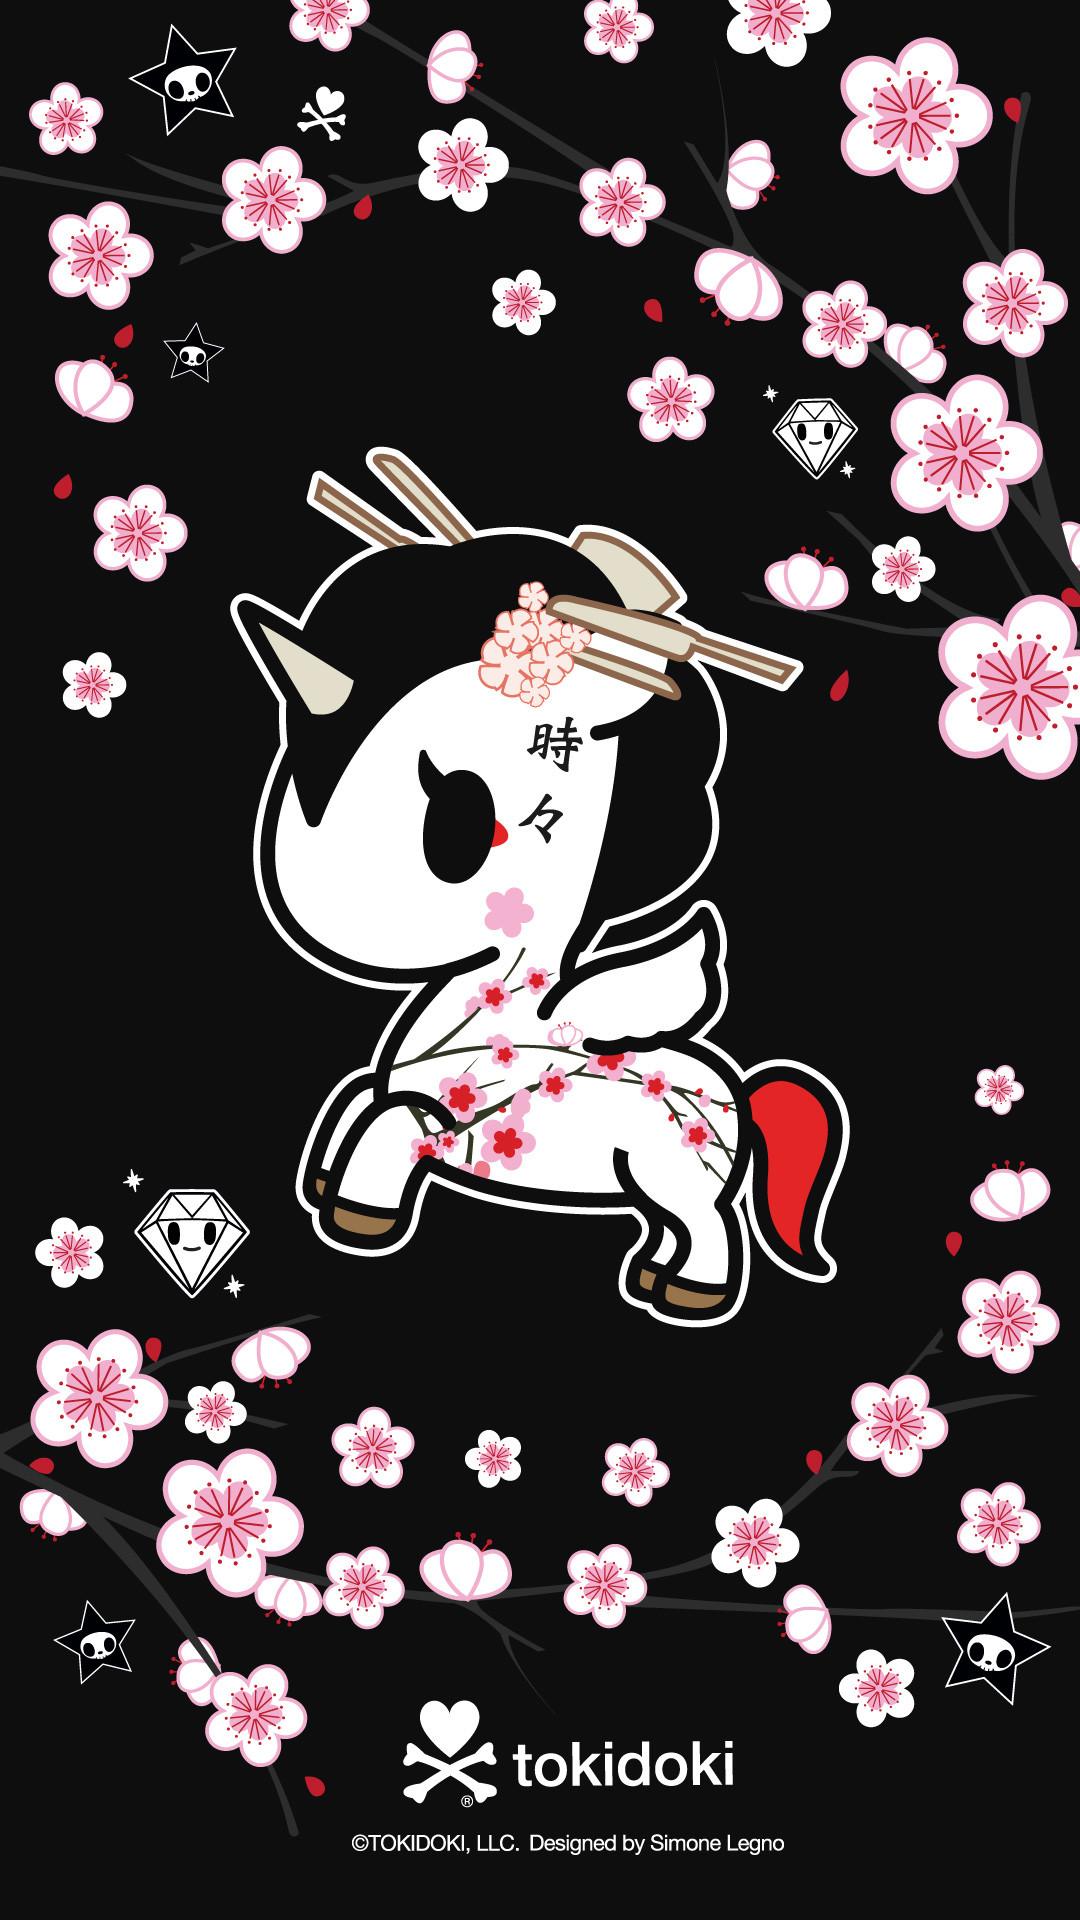 Tokidoki Unicorno Wallpaper 69 Images